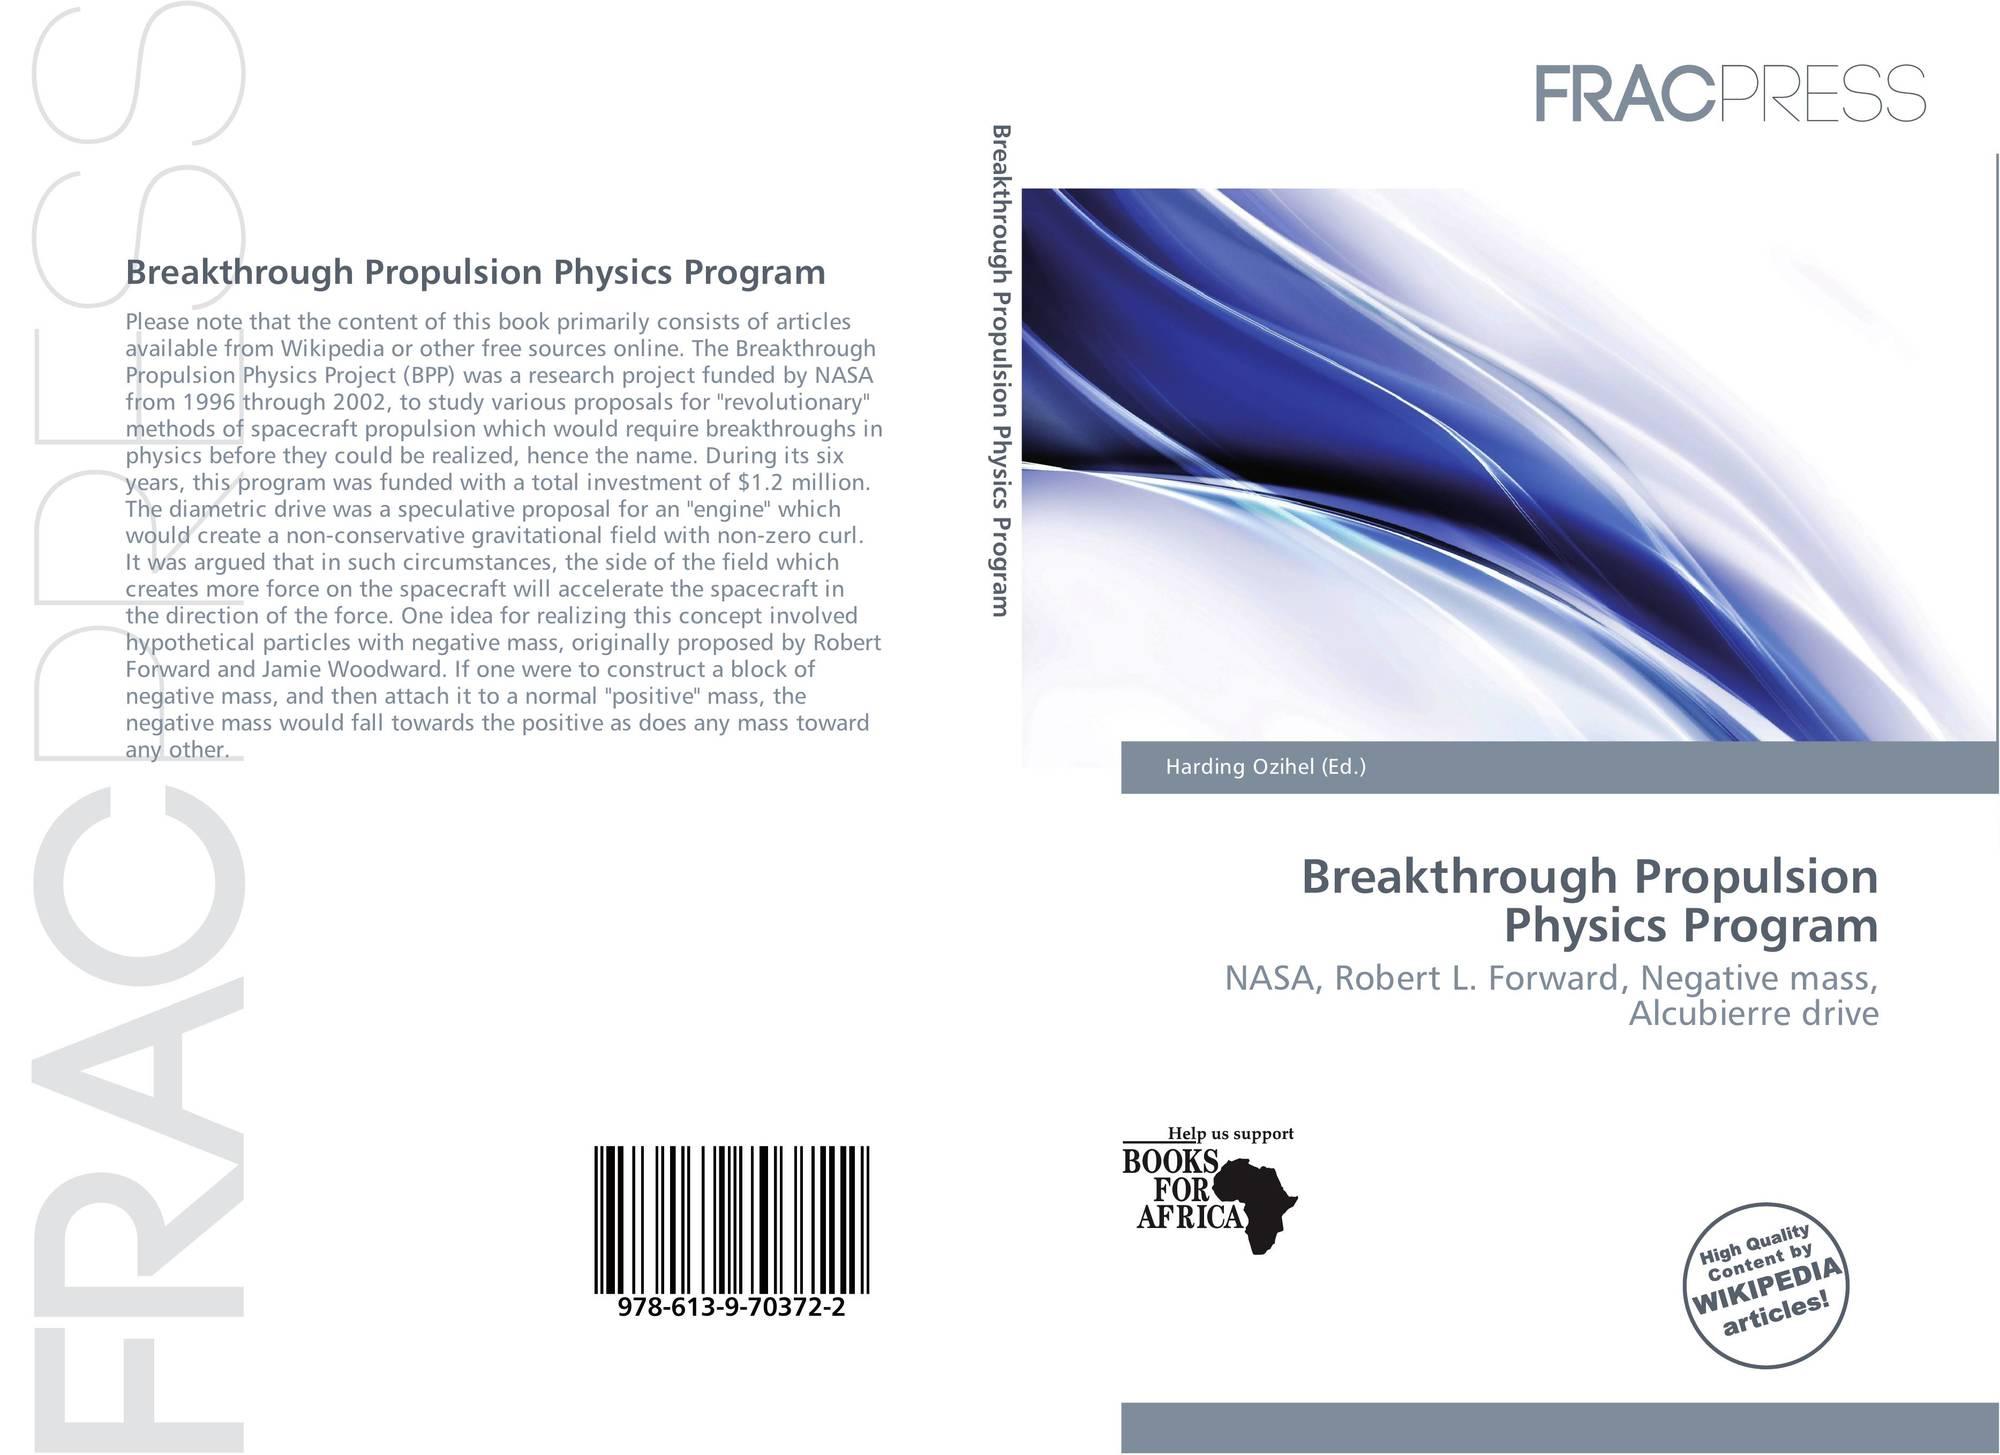 nasa breakthrough propulsion physics program - photo #6